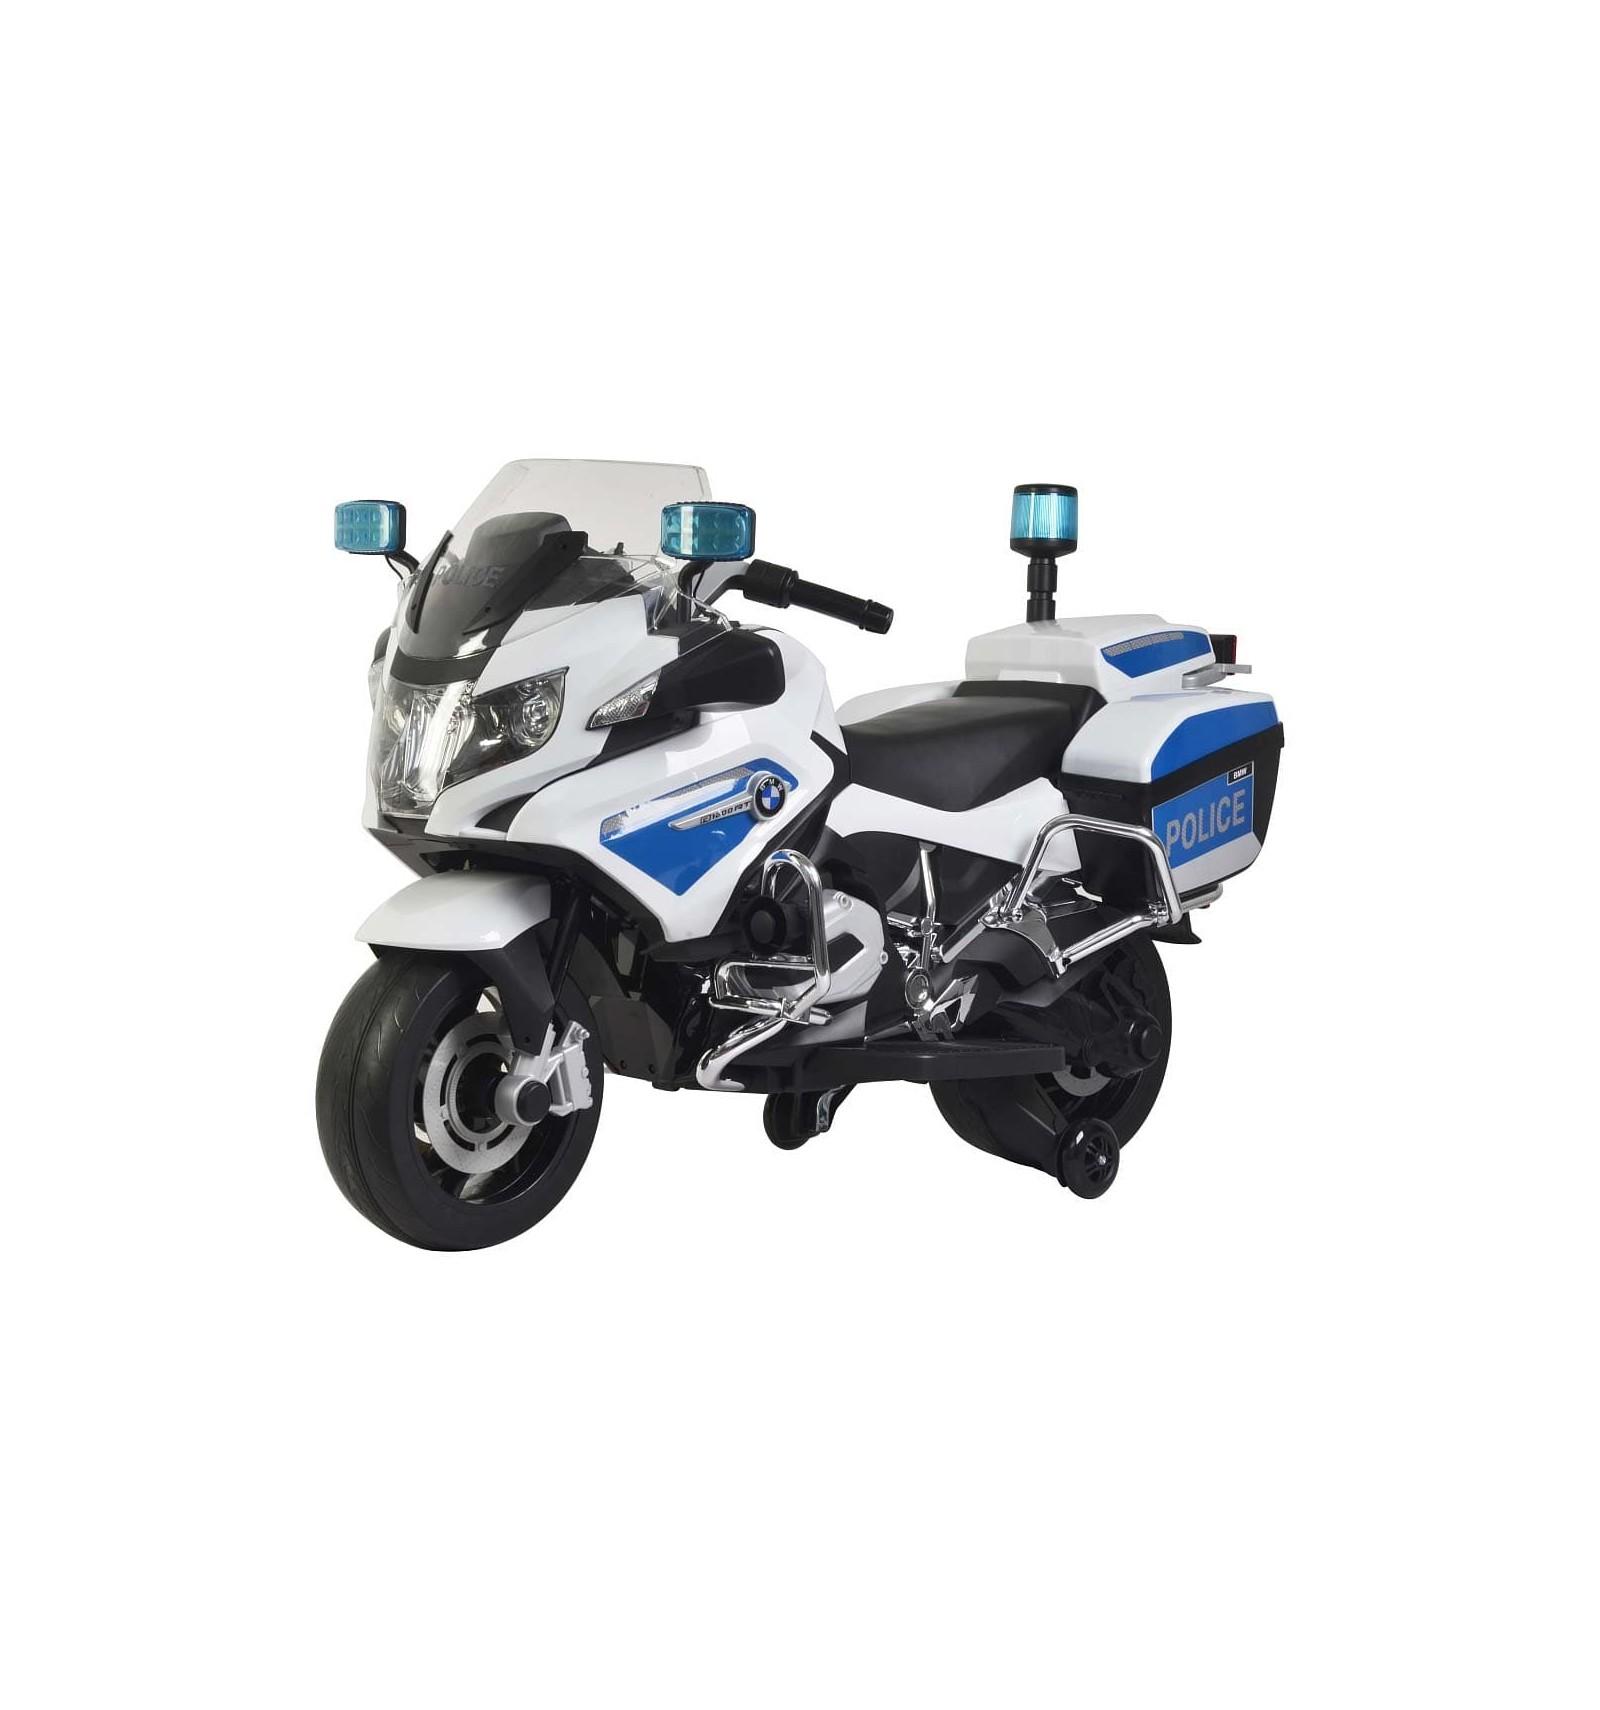 MOTO BMW R1200 RT POLICIA 12V BLANCO Y AZUL 4028